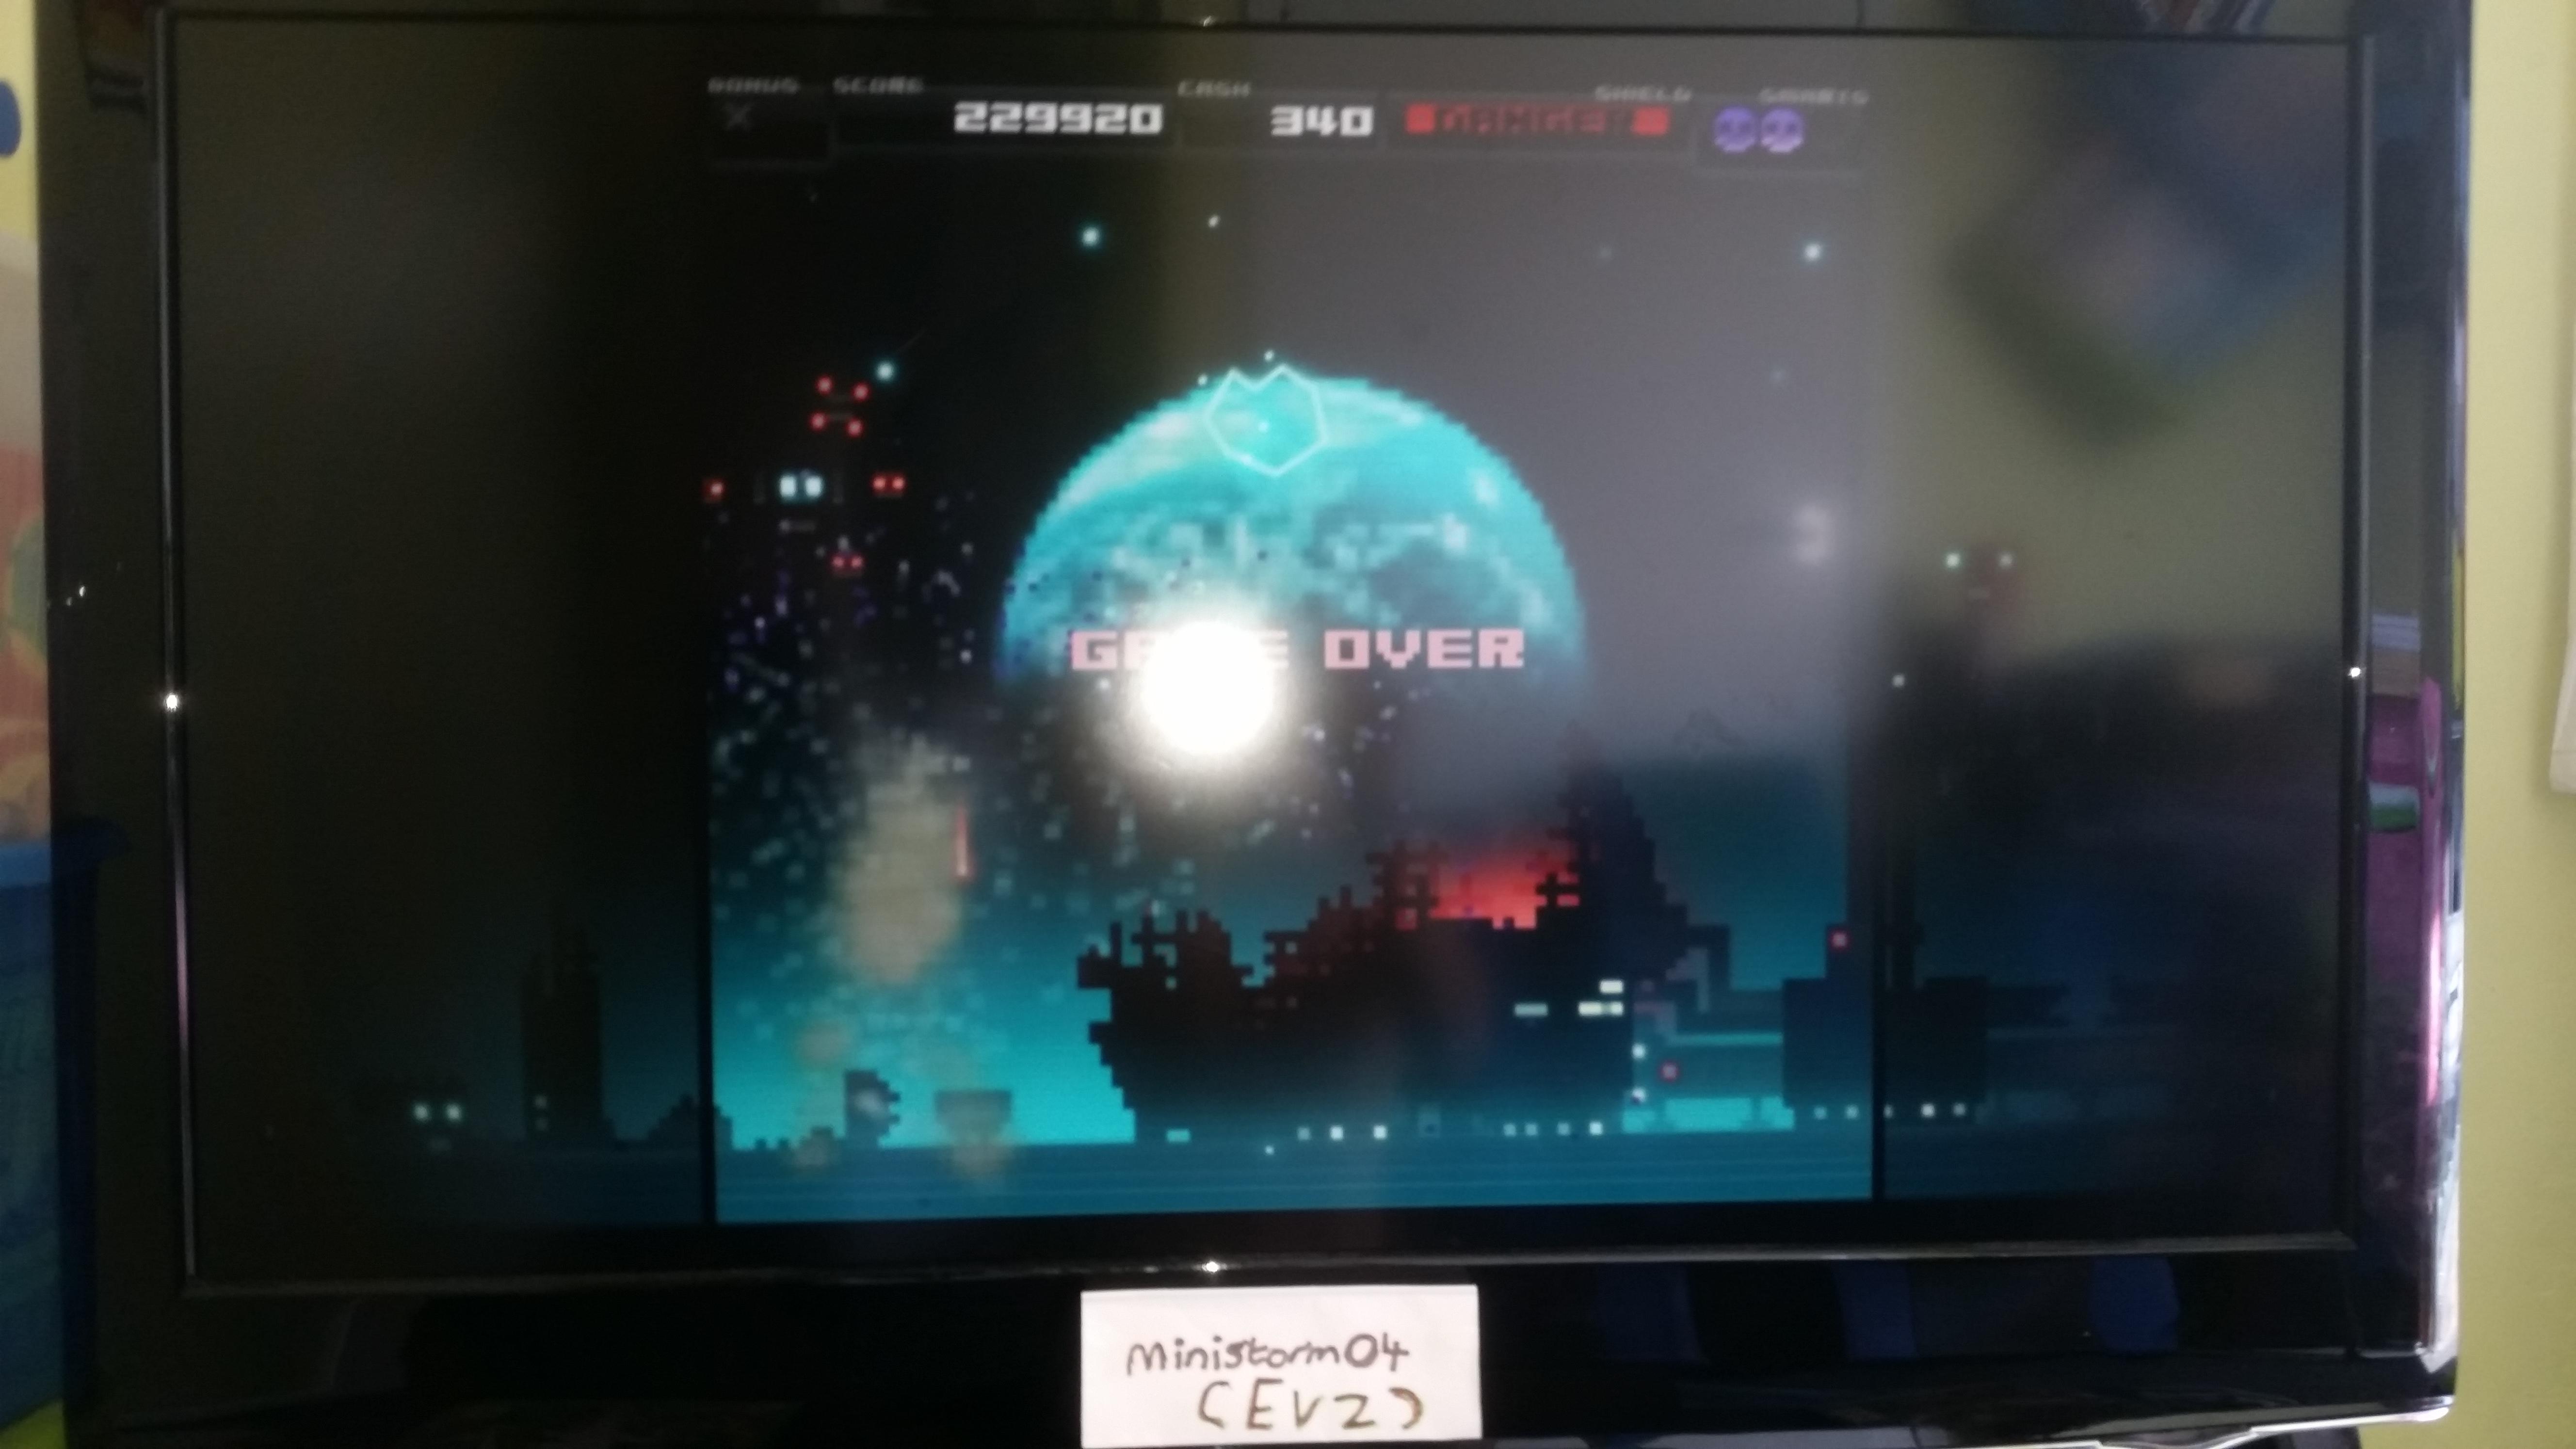 ministorm04: Titan Attacks [Earth Start] (Playstation 4) 229,920 points on 2019-06-15 06:57:31